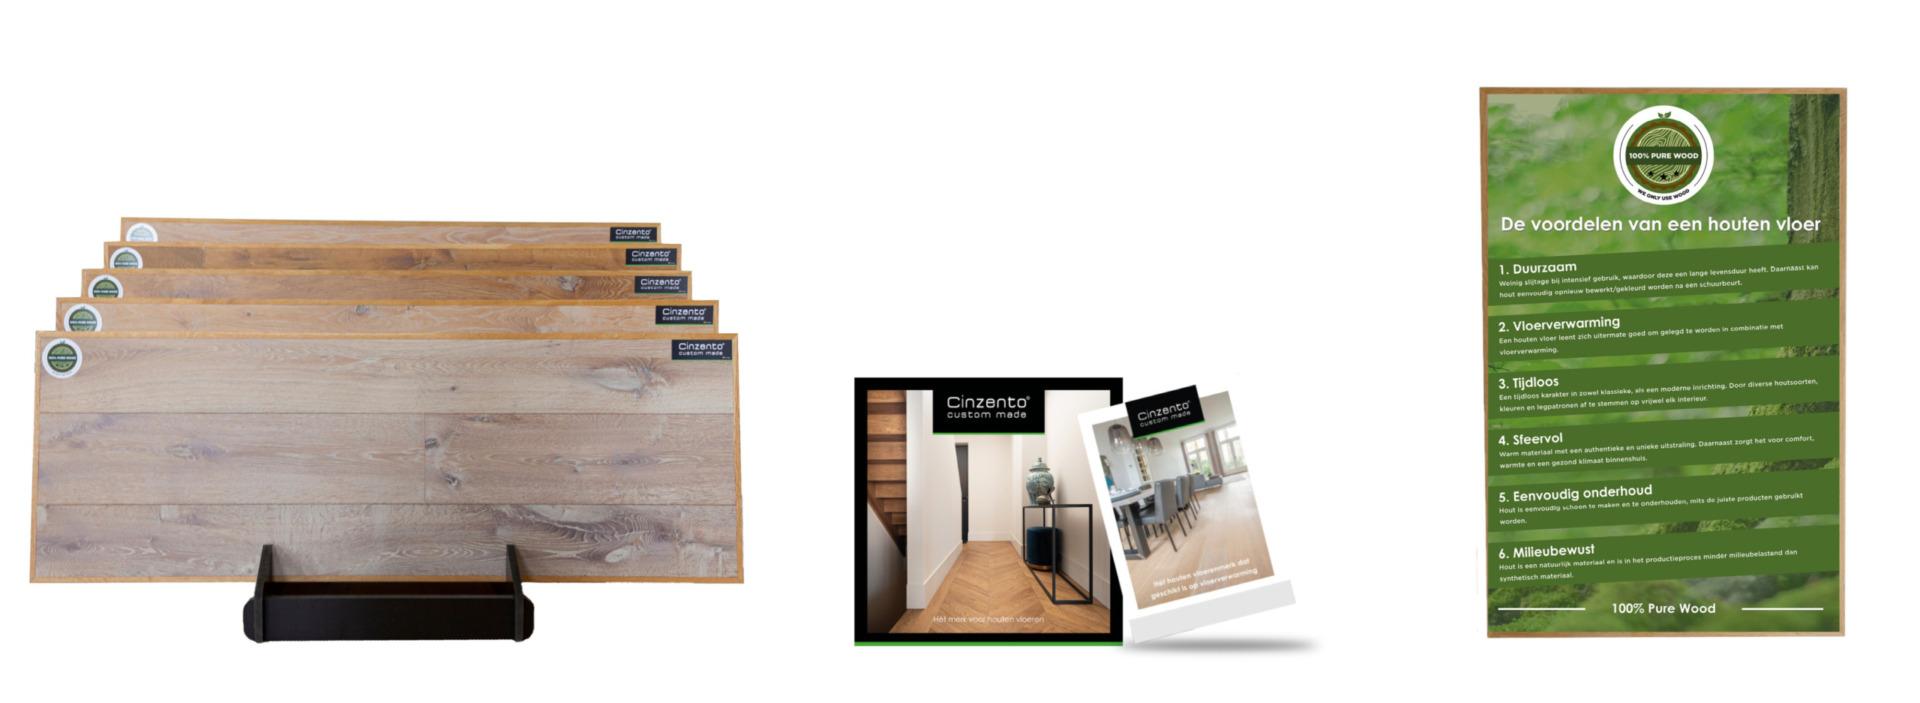 Presentatiemateriaal tg wood